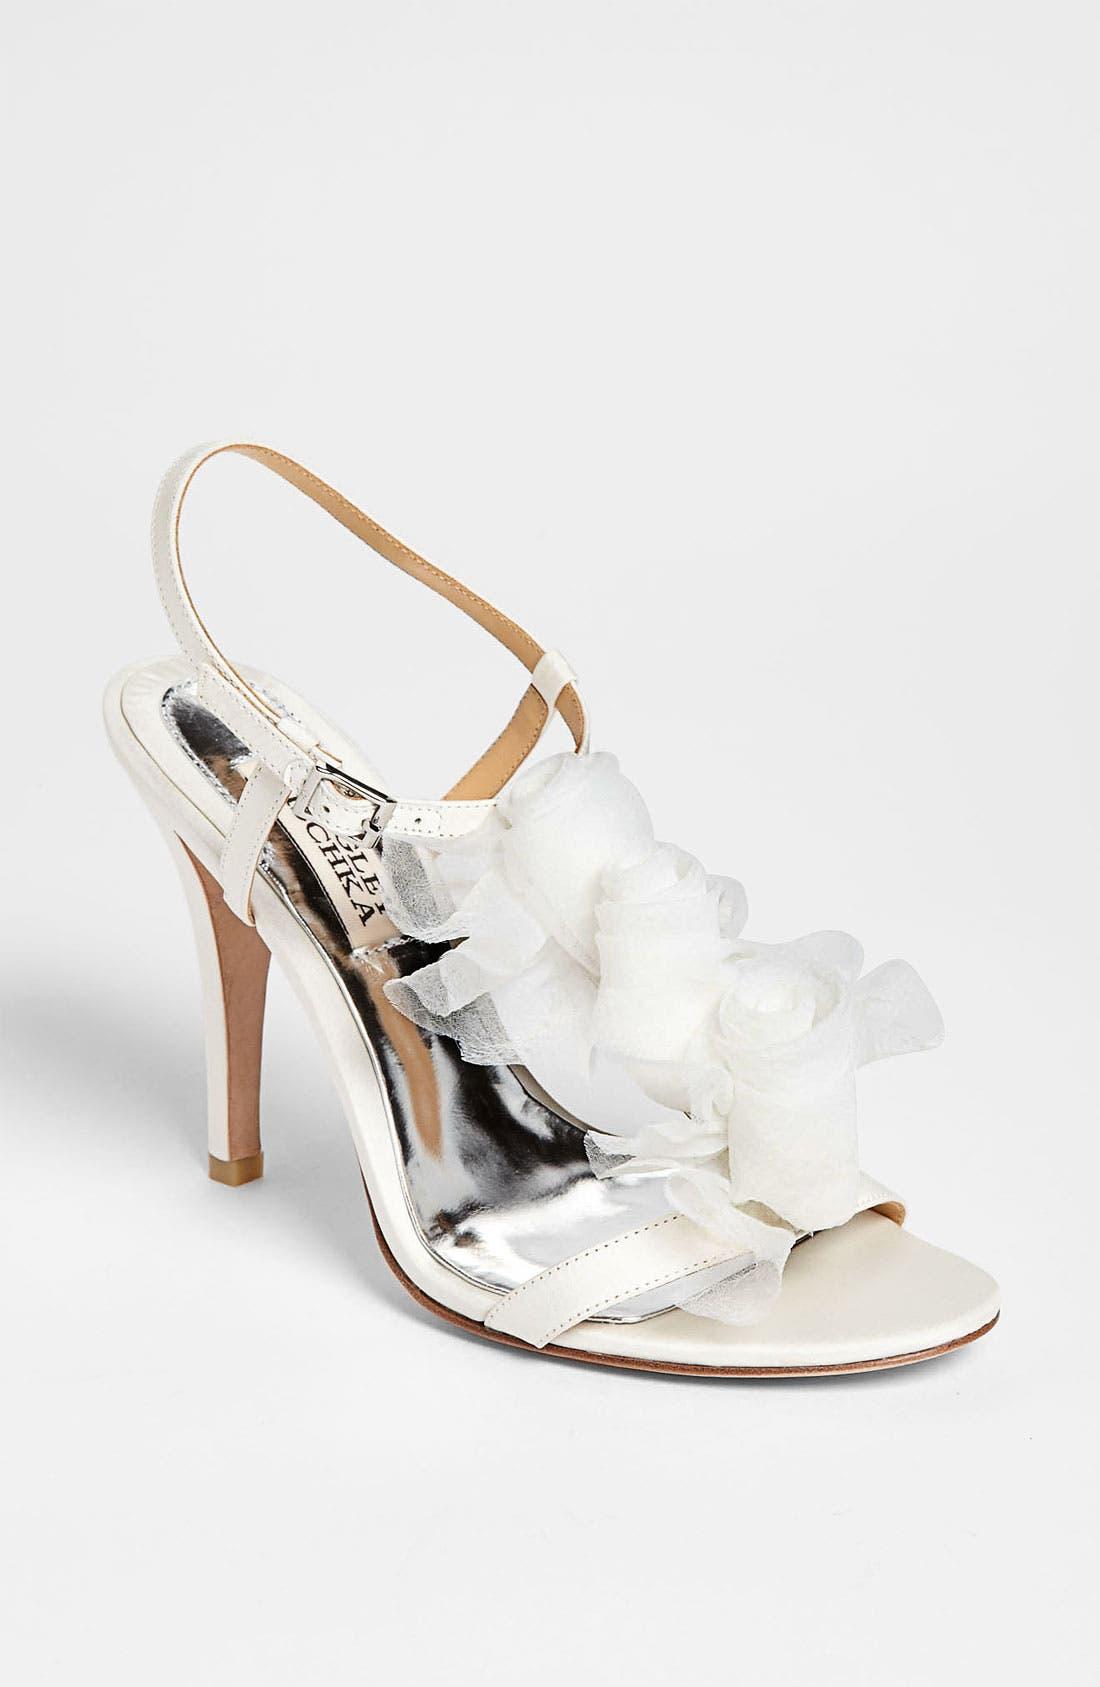 Alternate Image 1 Selected - Badgley Mischka 'Cissy' Sandal